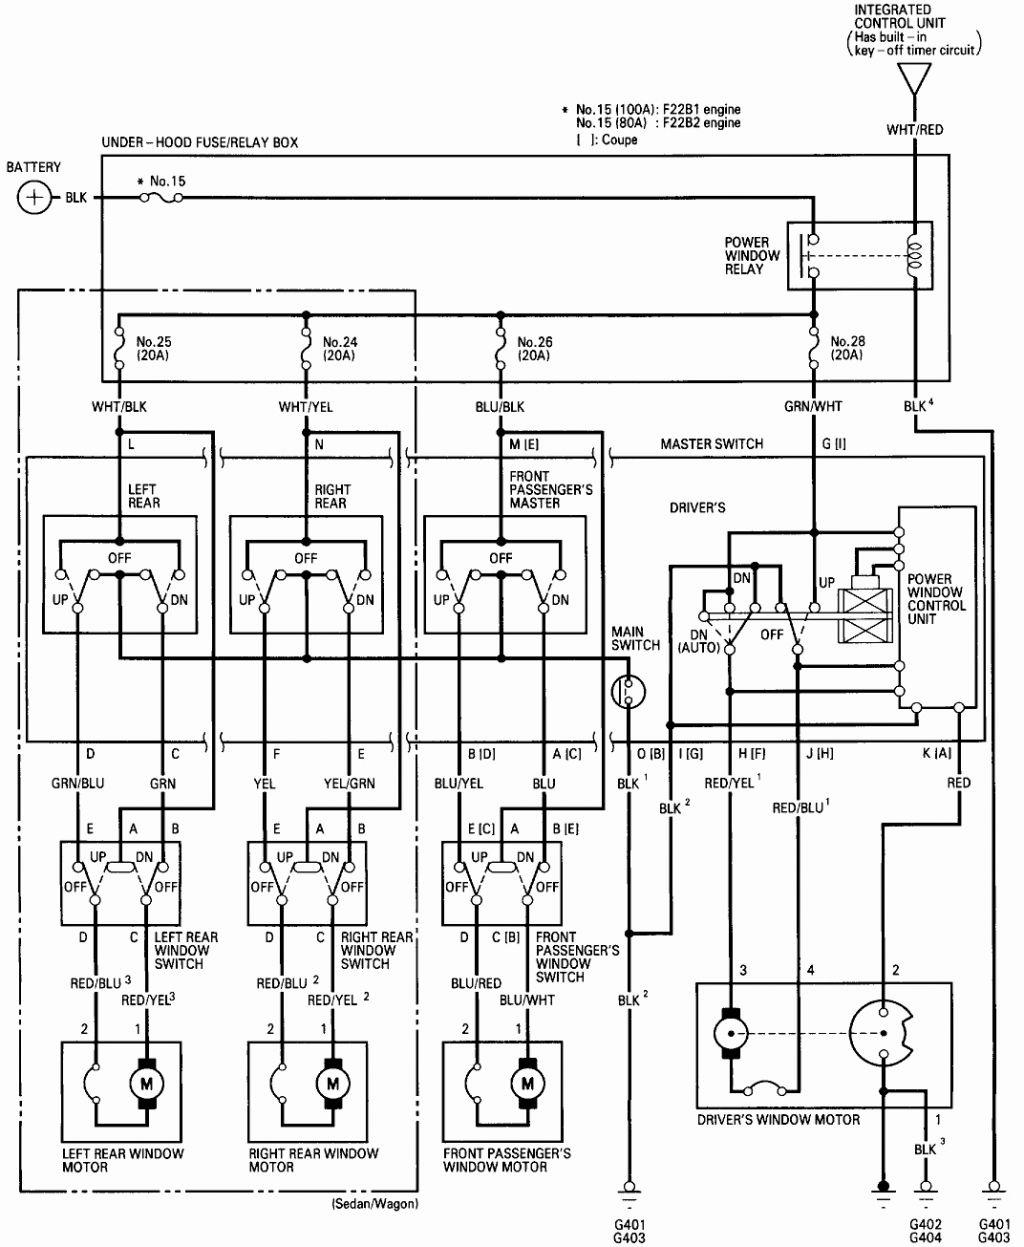 Dodge Durango Wiring Diagram As Well 2001 Dodge Durango Wiring Diagram